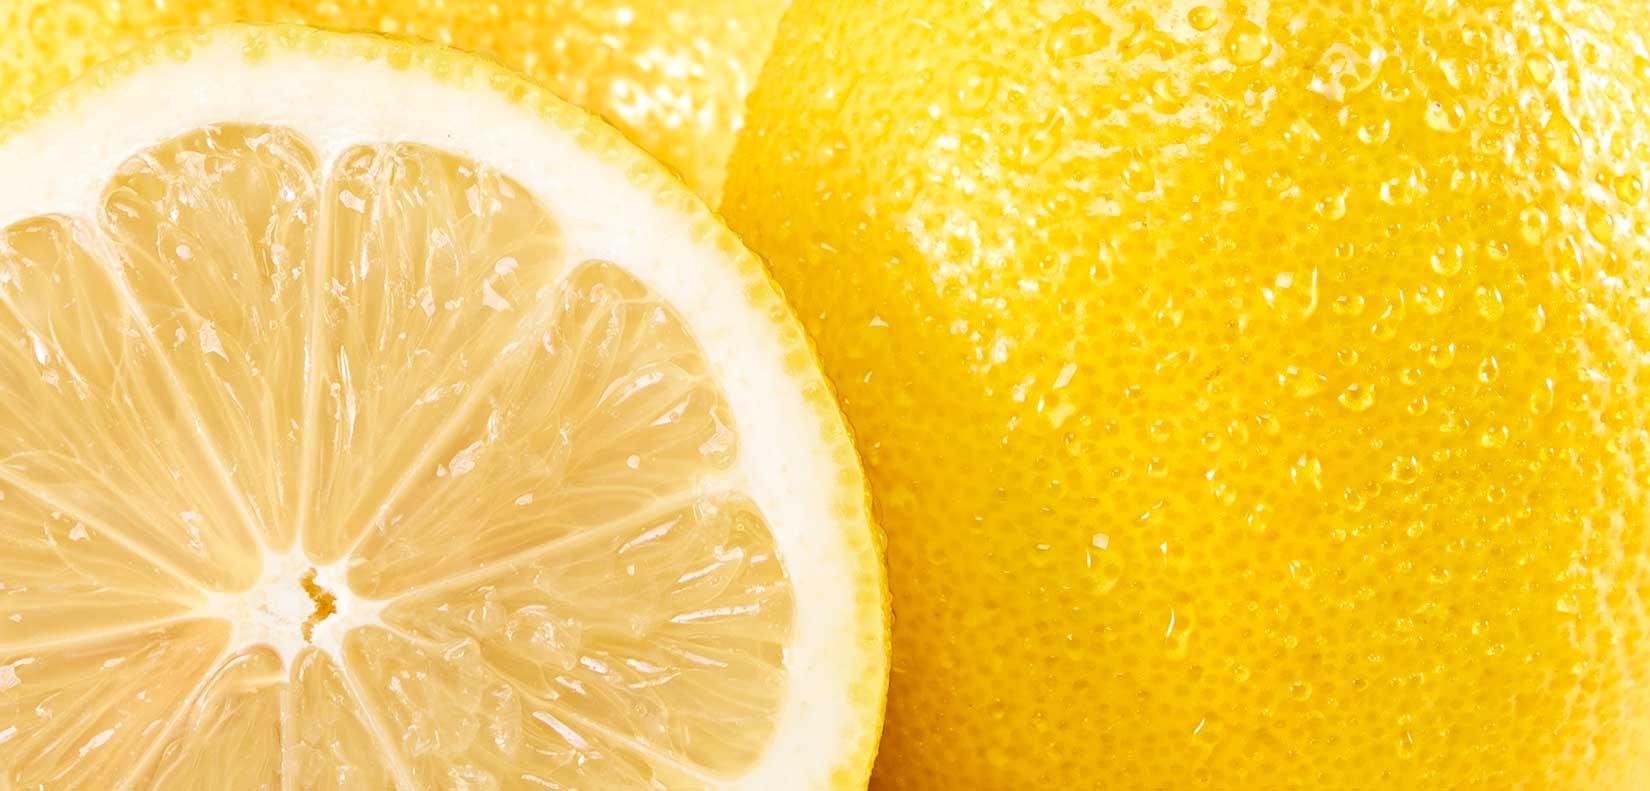 ASM® Zitronen Aroma 930309 fuer Speiseeis